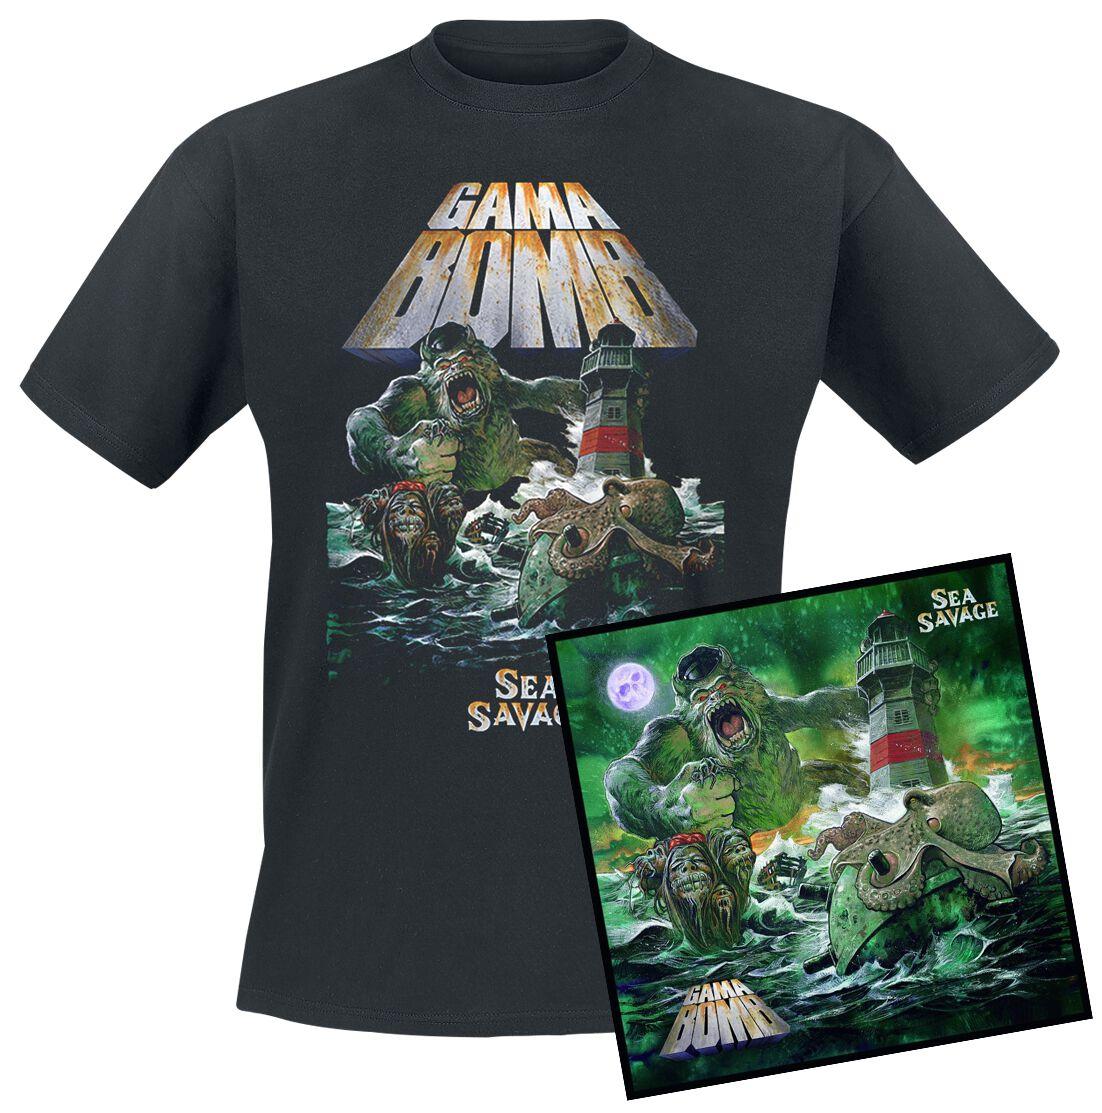 Image of Gama Bomb Sea savage CD & T-Shirt Standard